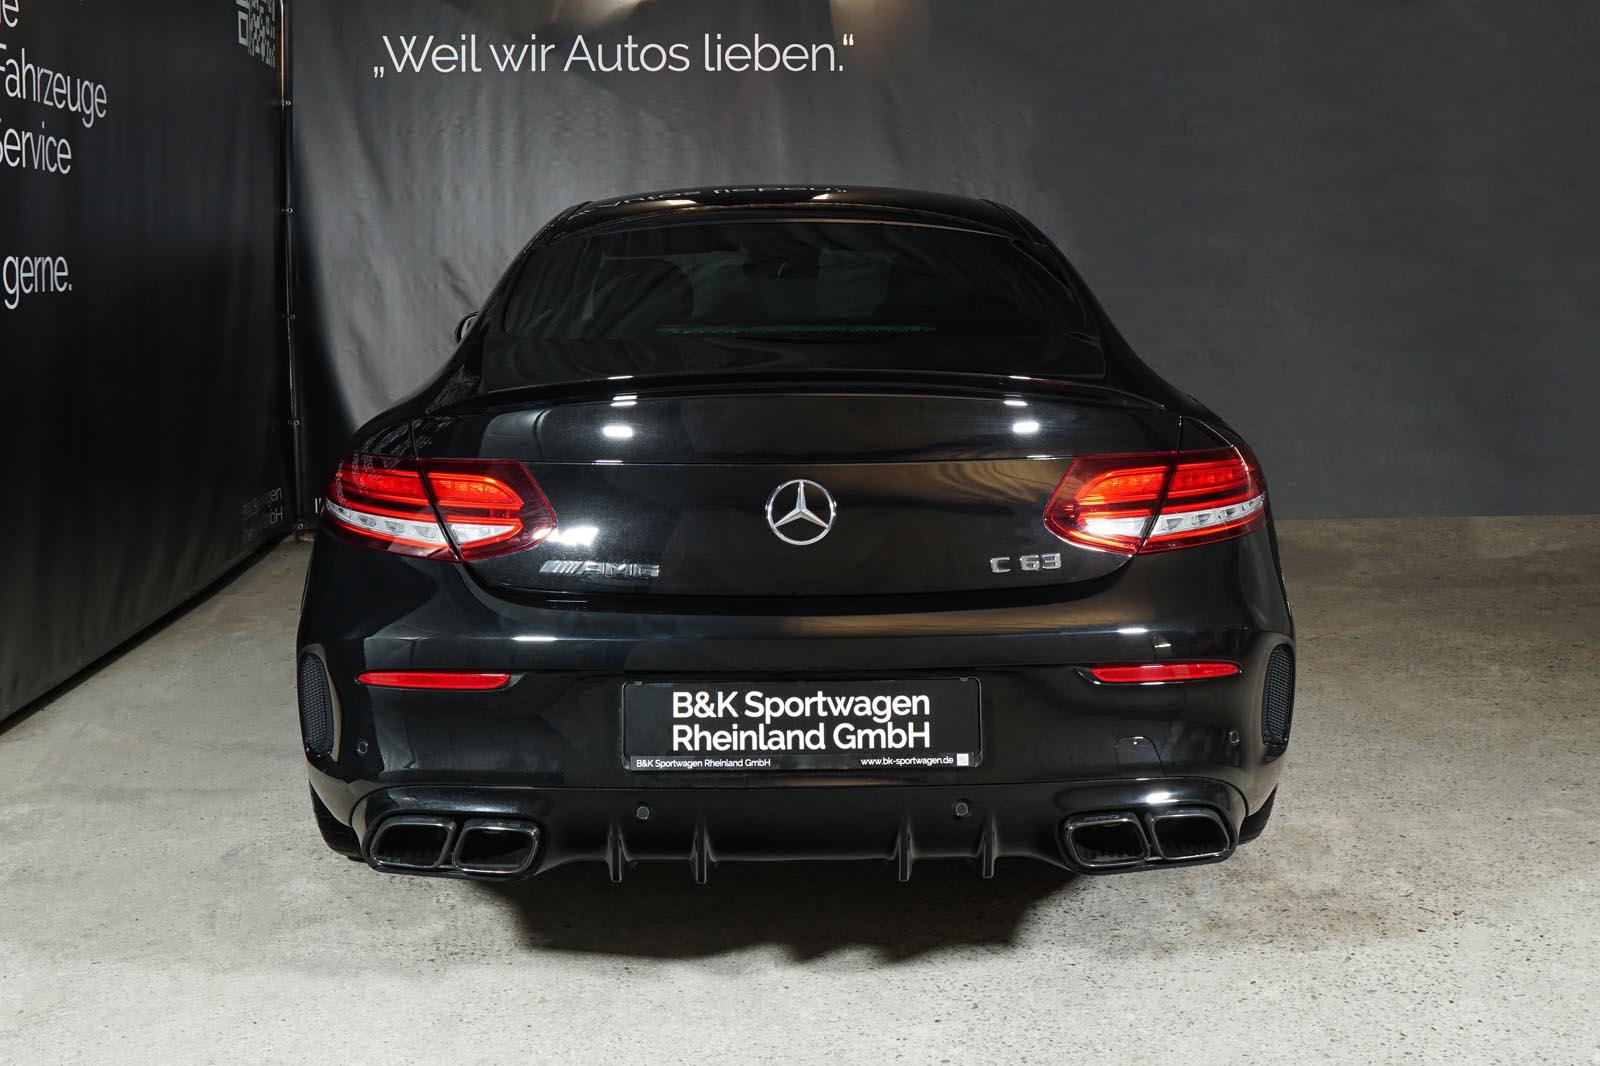 11mercedes-benz-c63-s-amg-coupe-schwarz_3